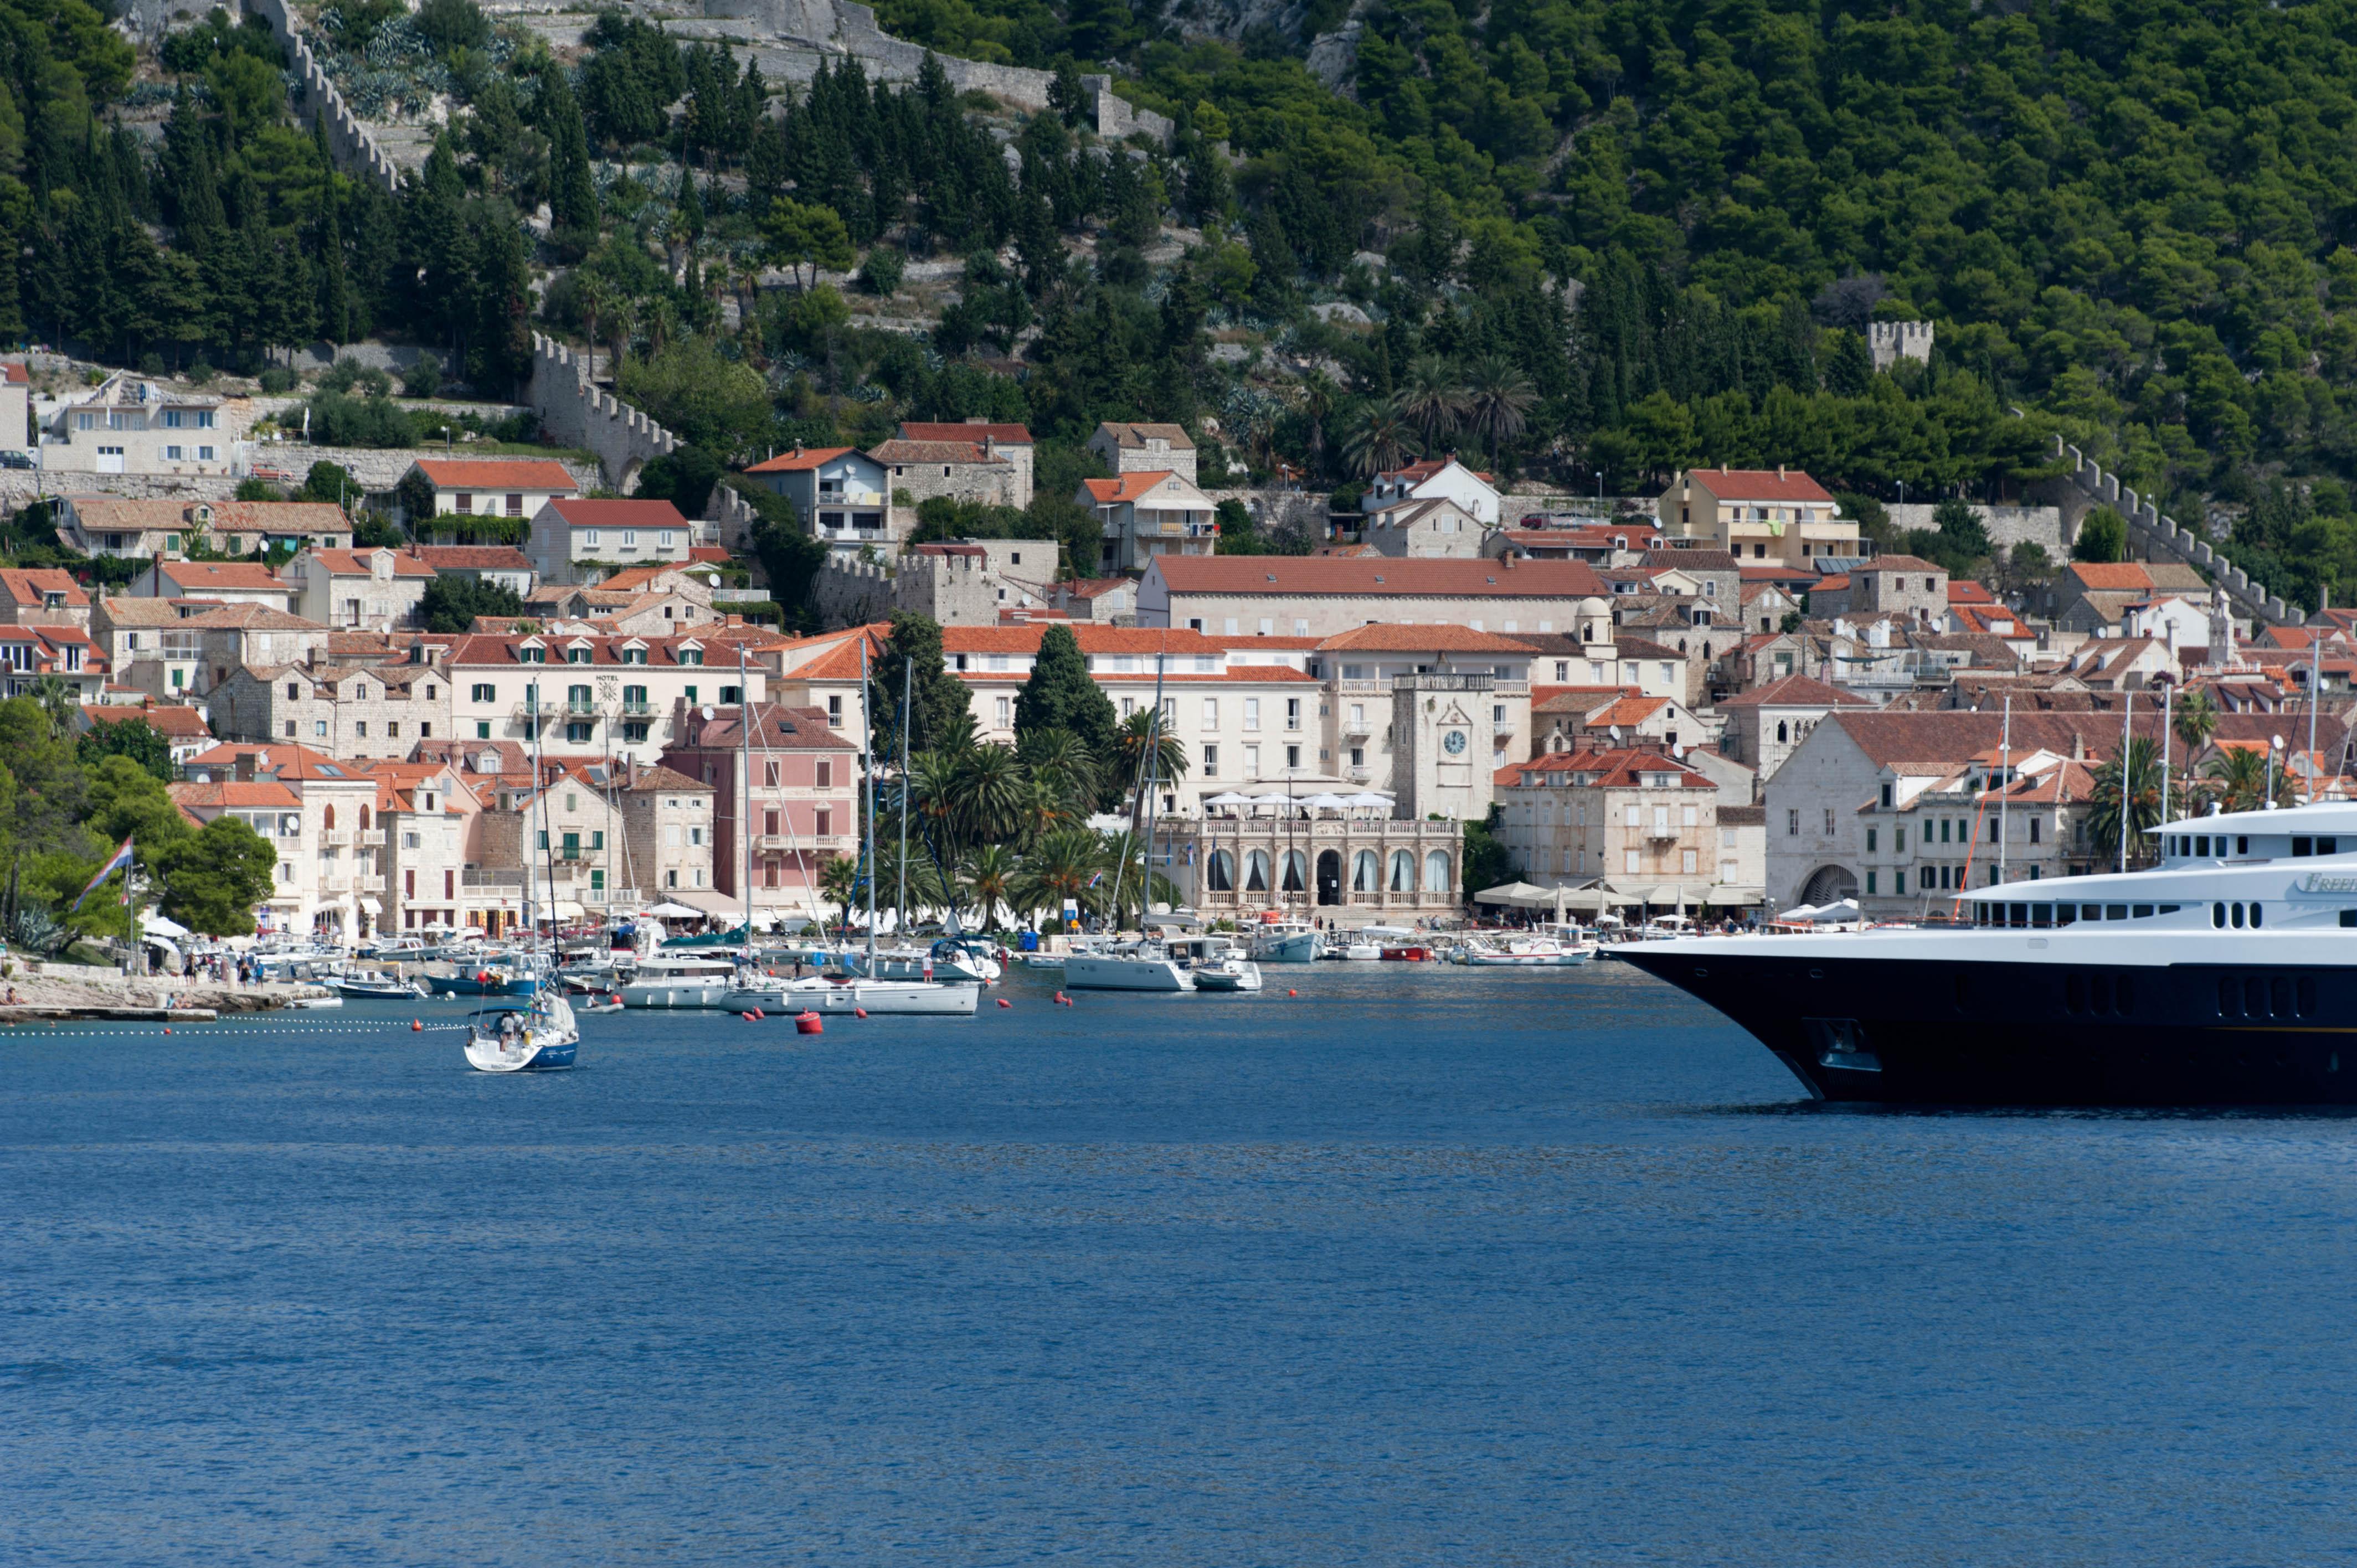 9851-Hvar (Dalmatie centrale)